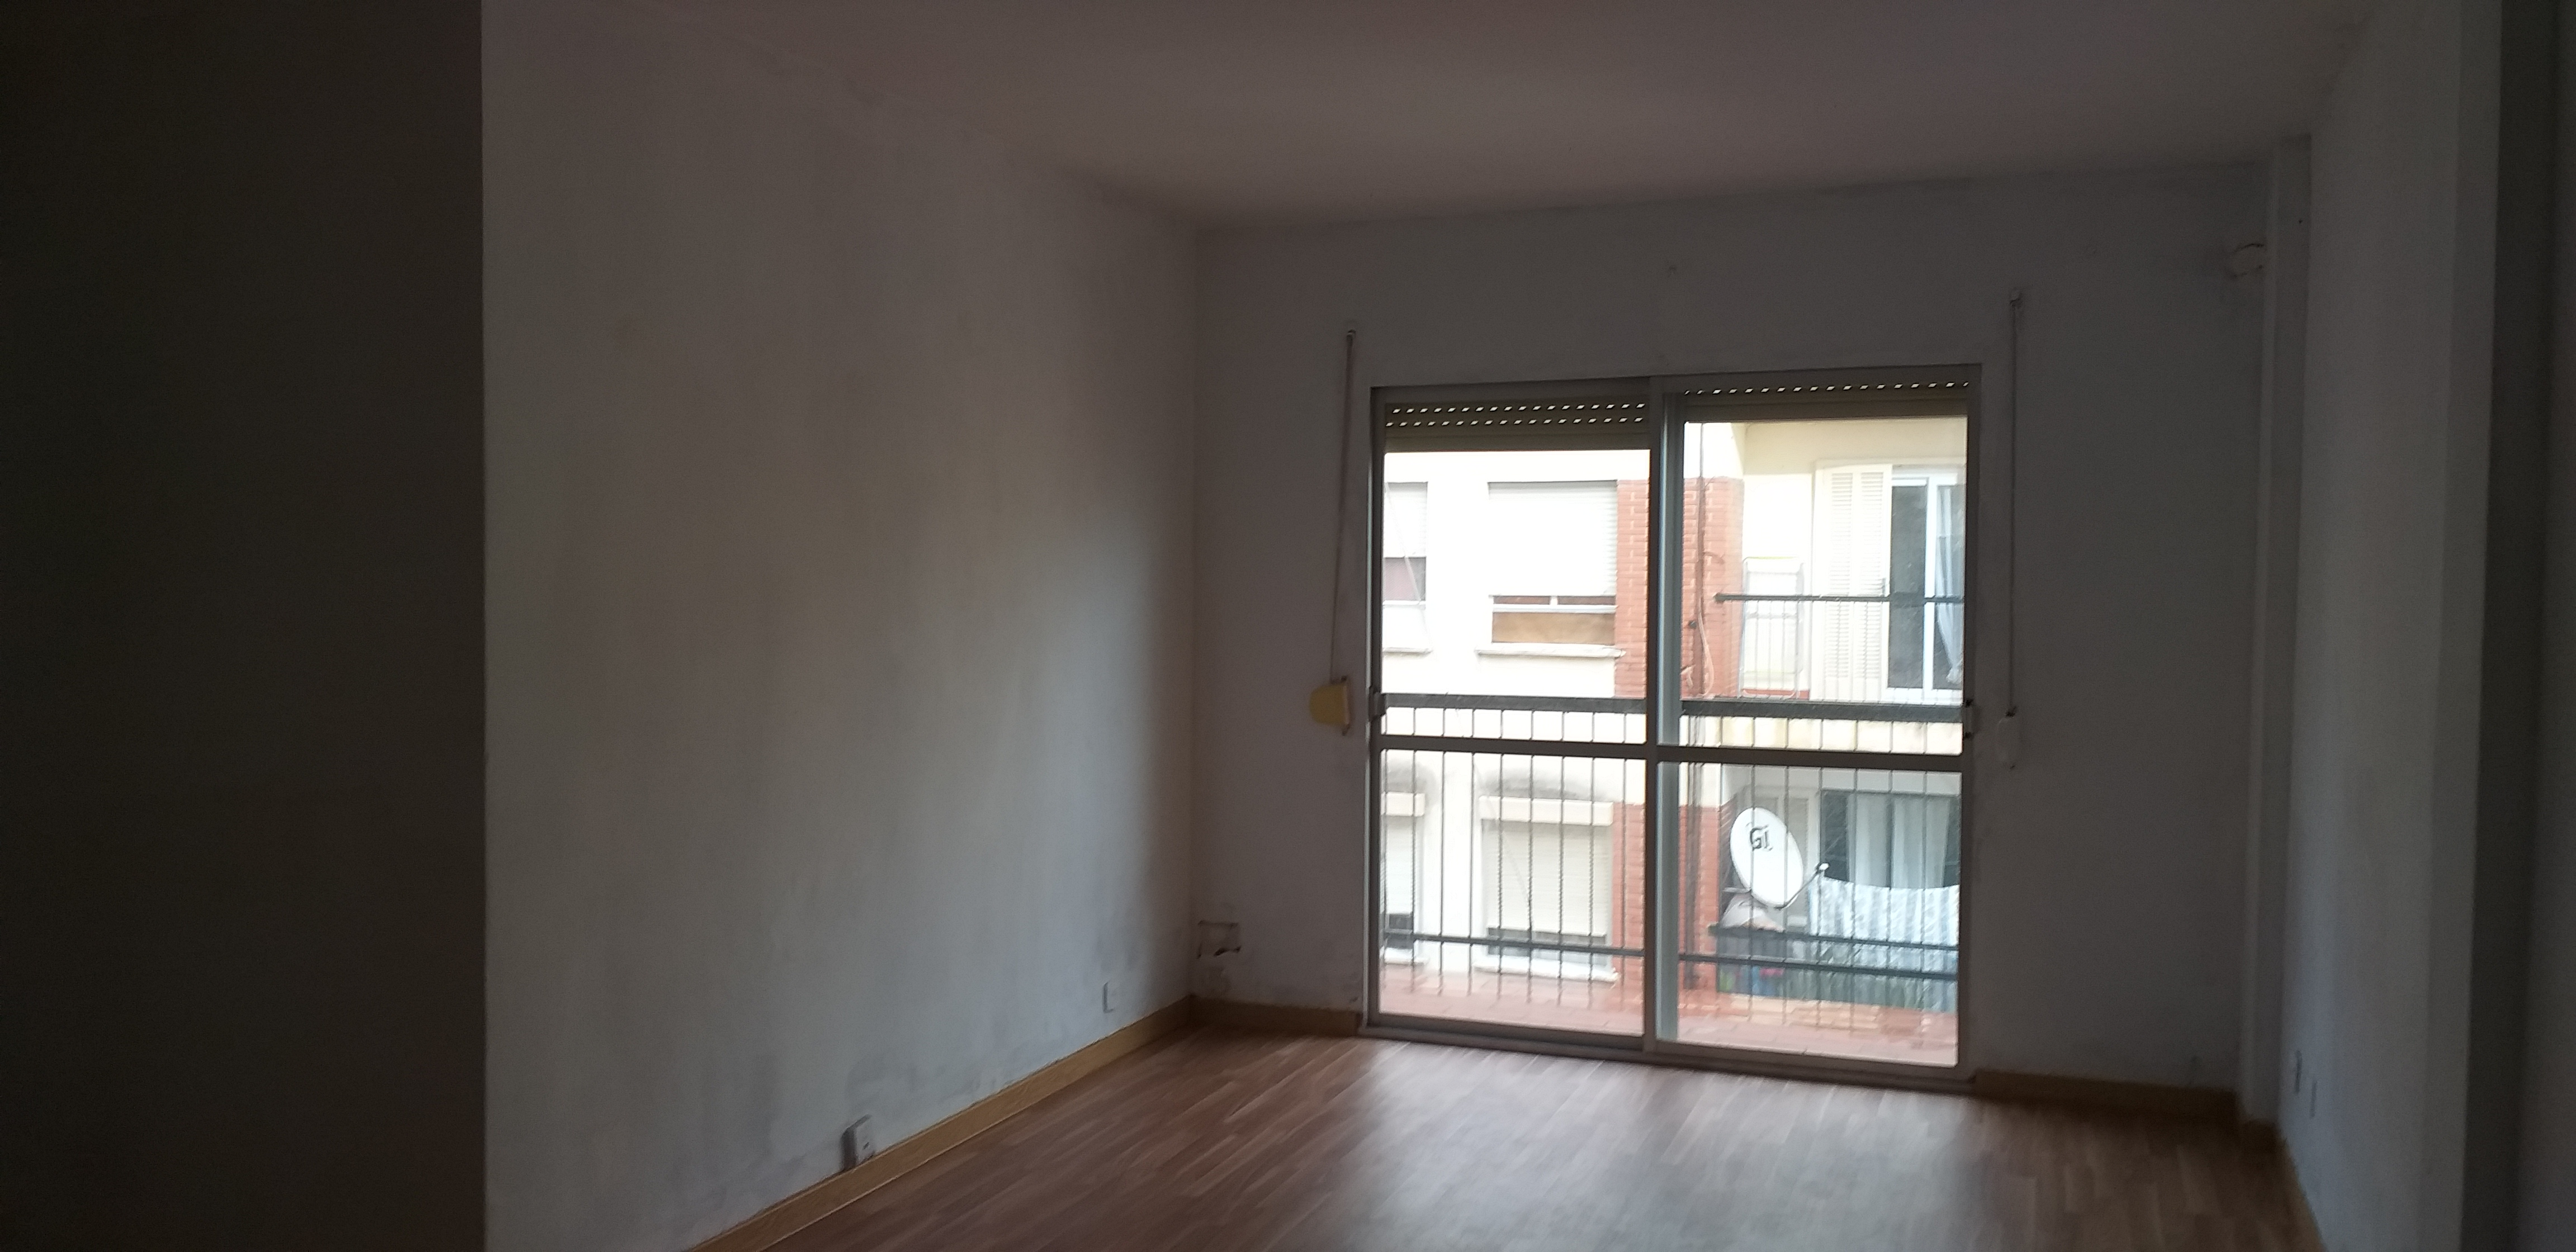 Alquiler Piso  C/ moscari. Solvia inmobiliaria - piso palma de mallorca